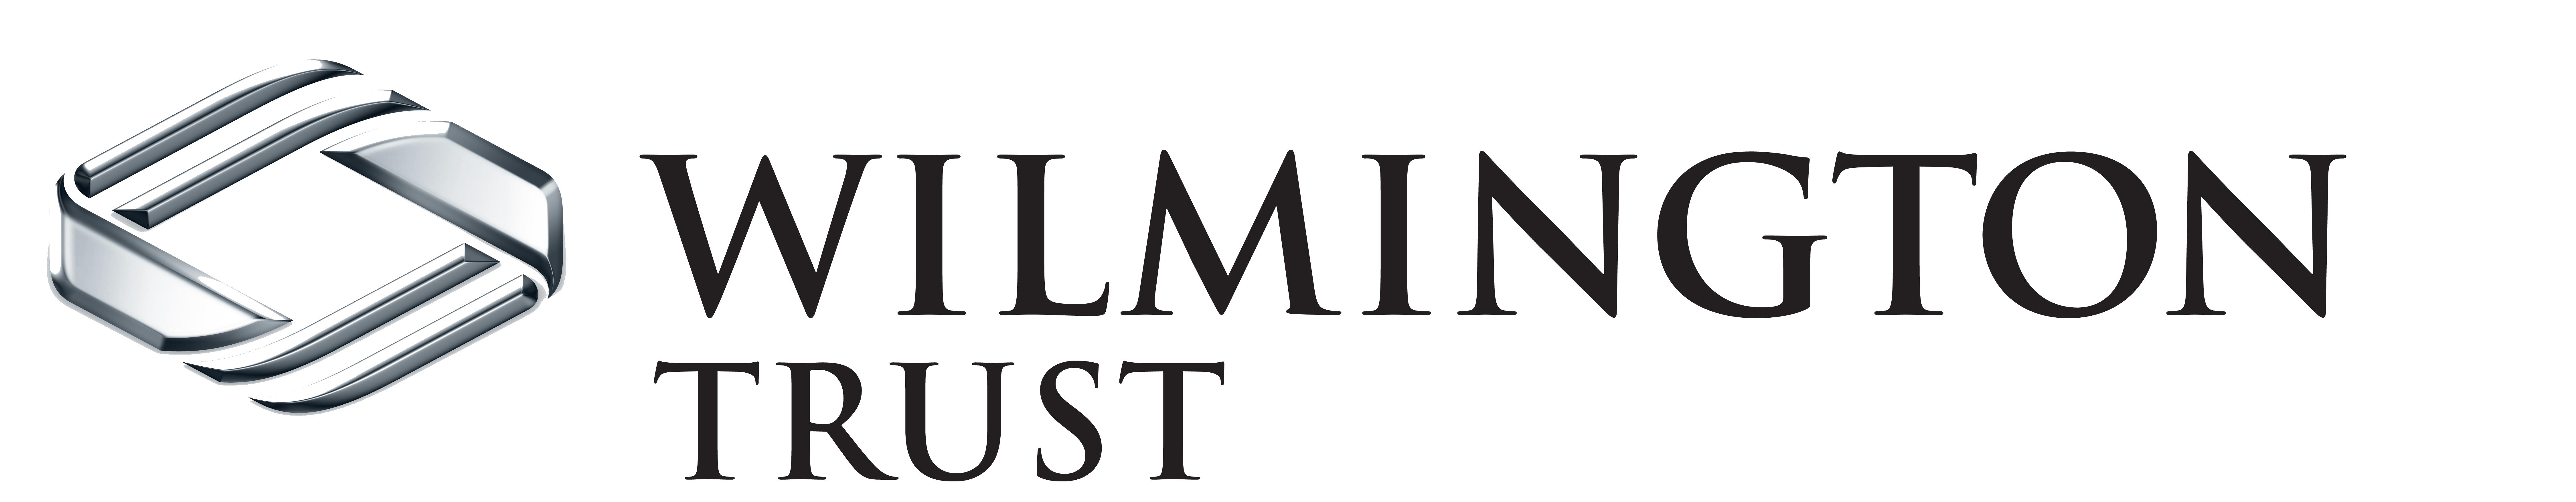 Wilmington Trust Dimensional _7543 transparent larger